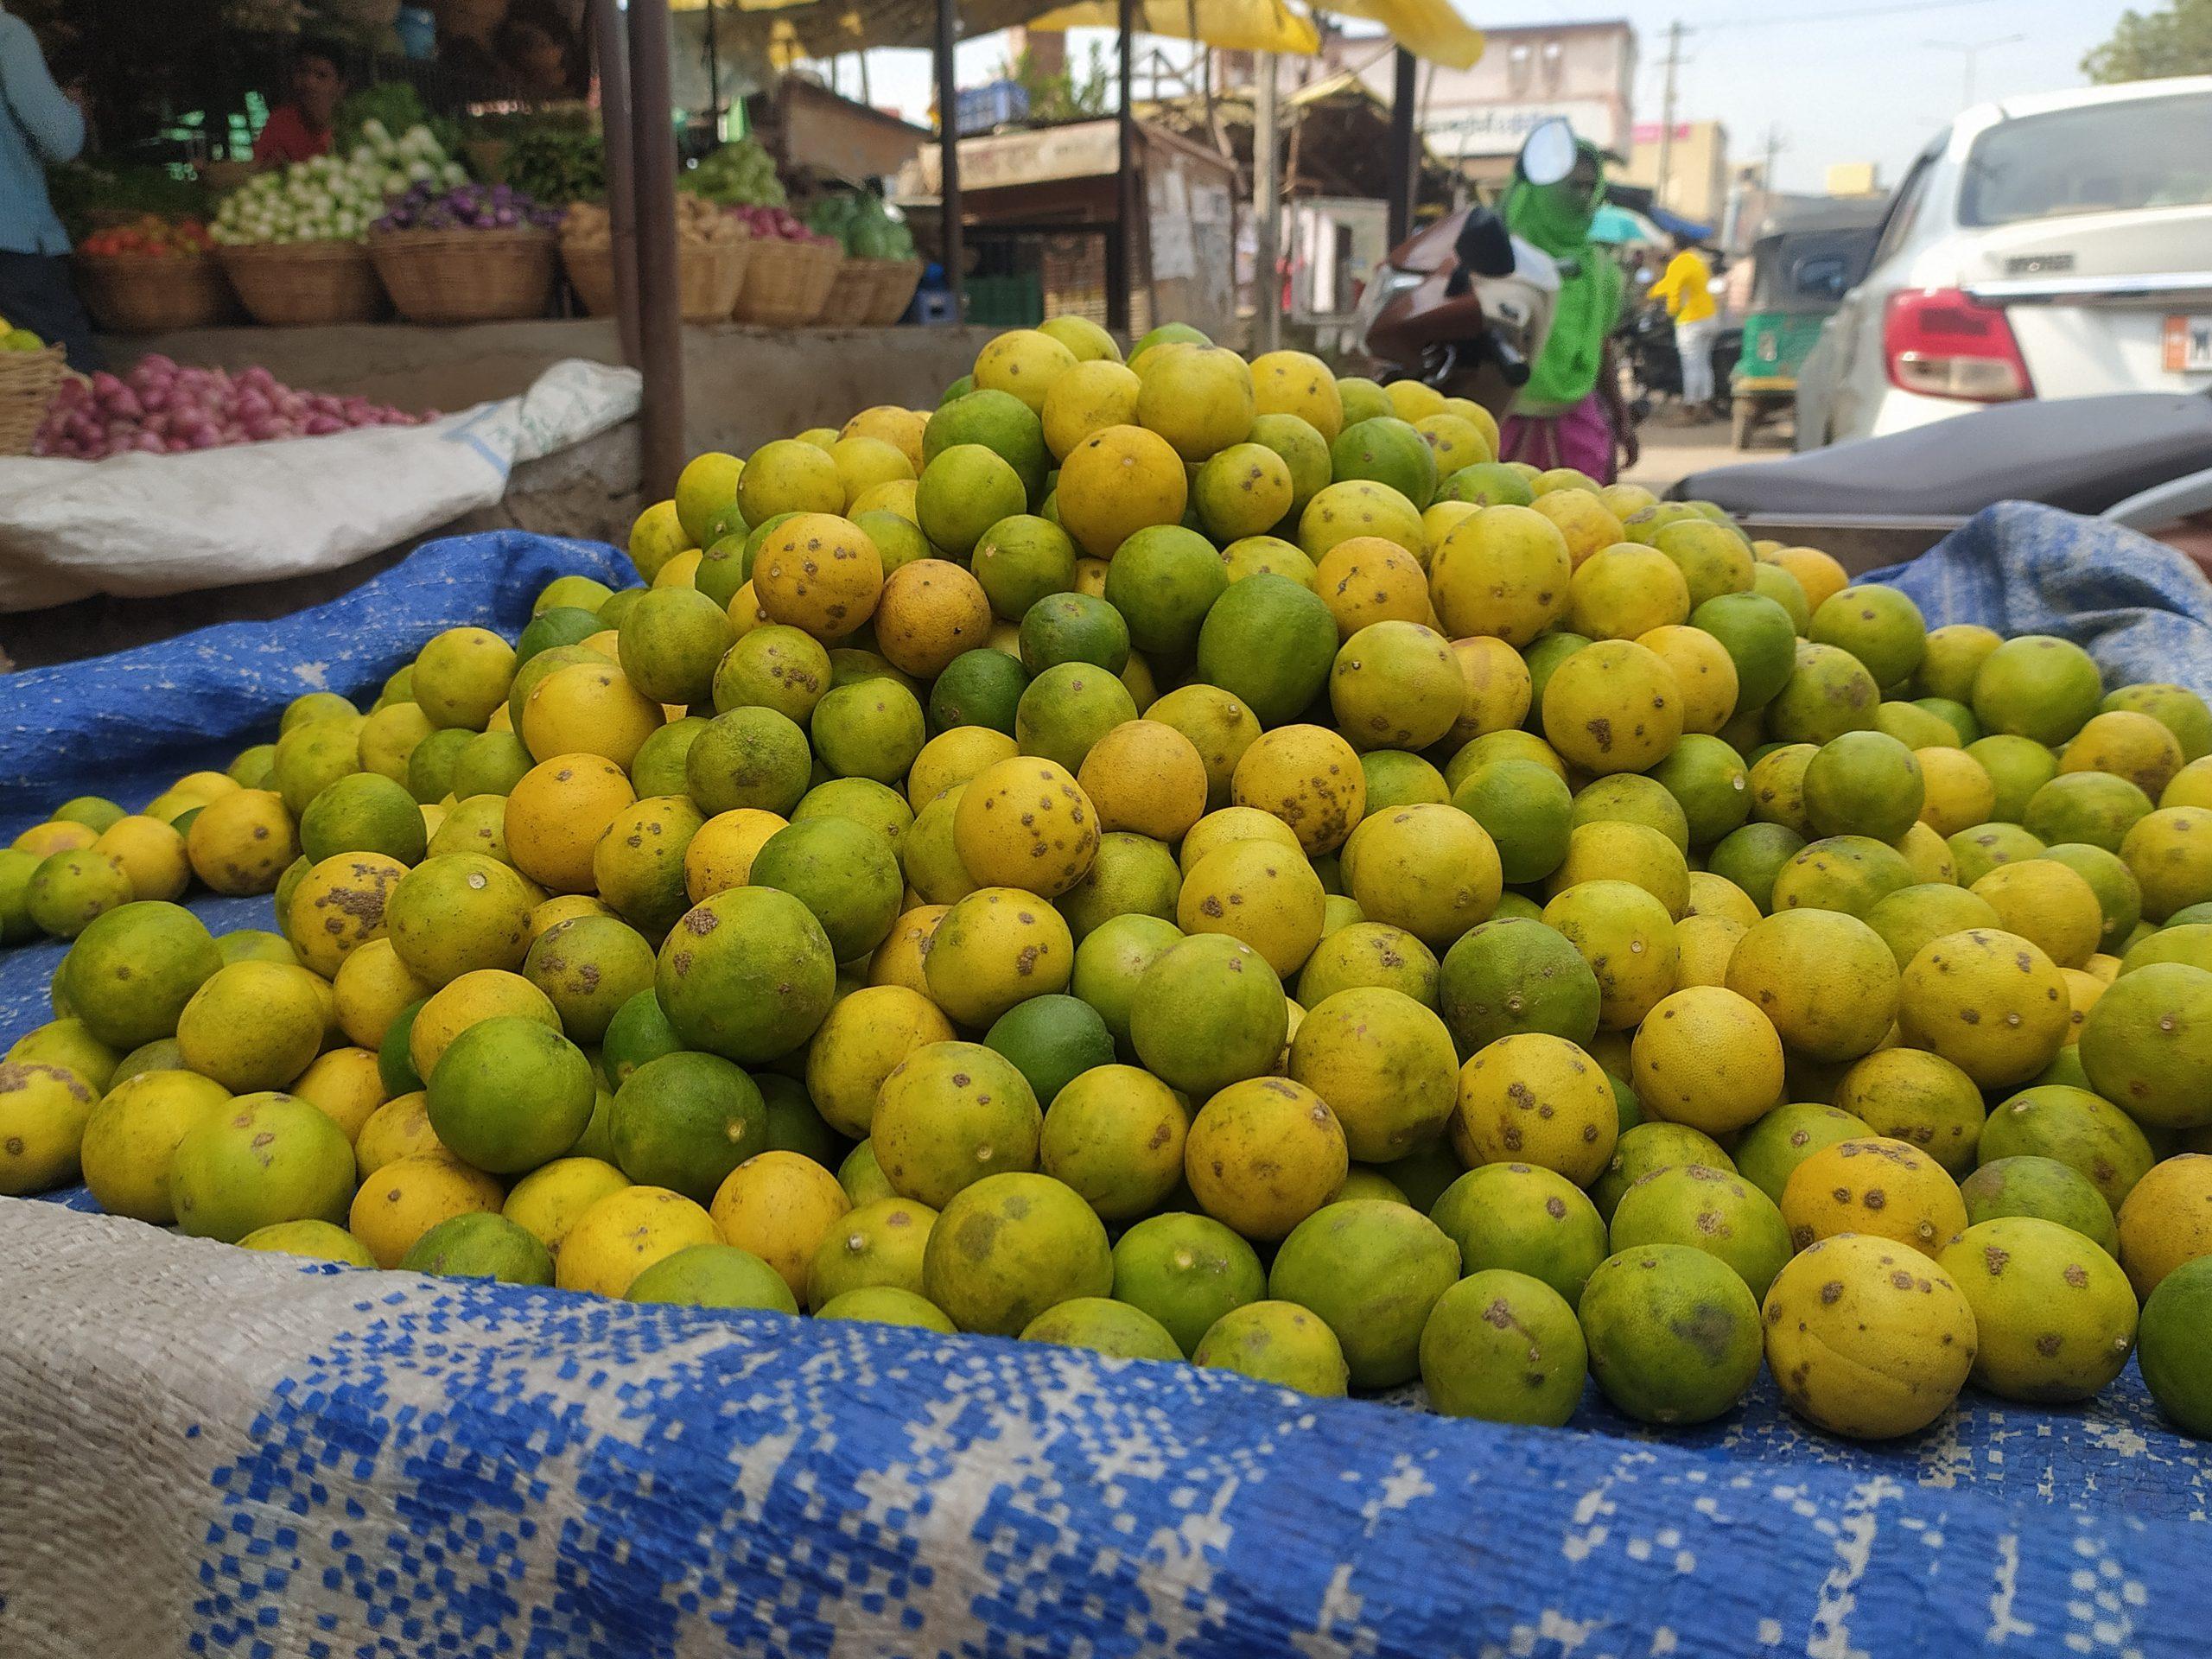 Selling lemons in a market place